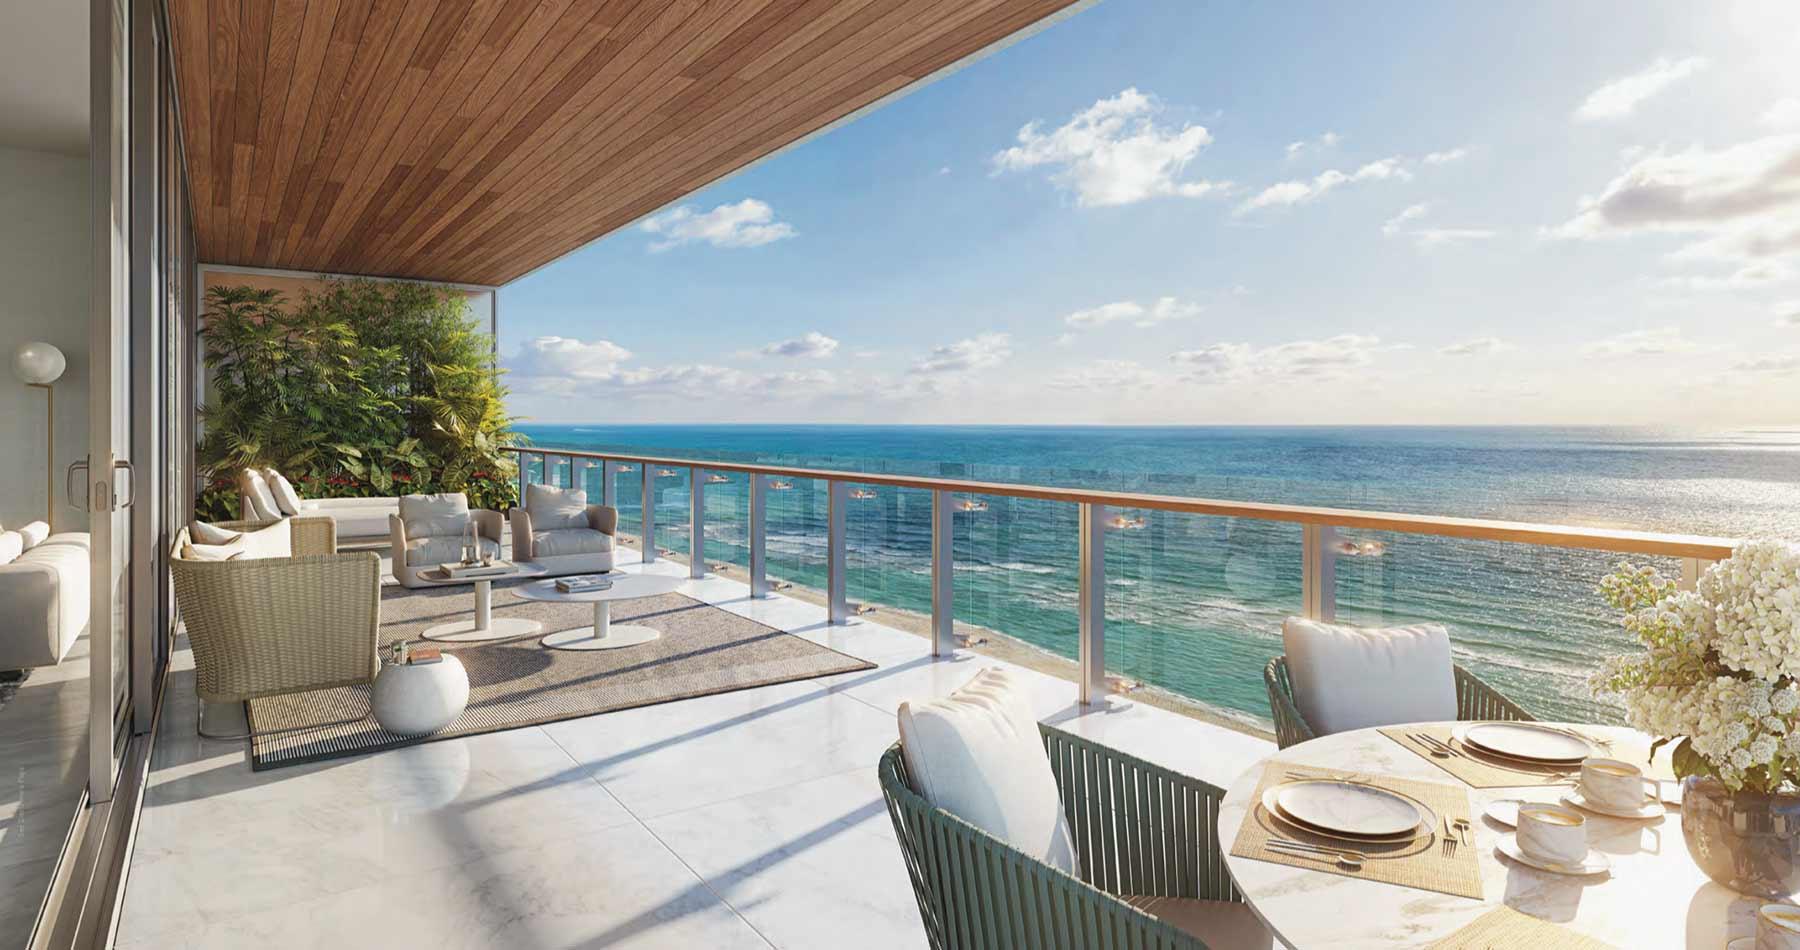 57Ocean-Miami-Beach-beach-balcony